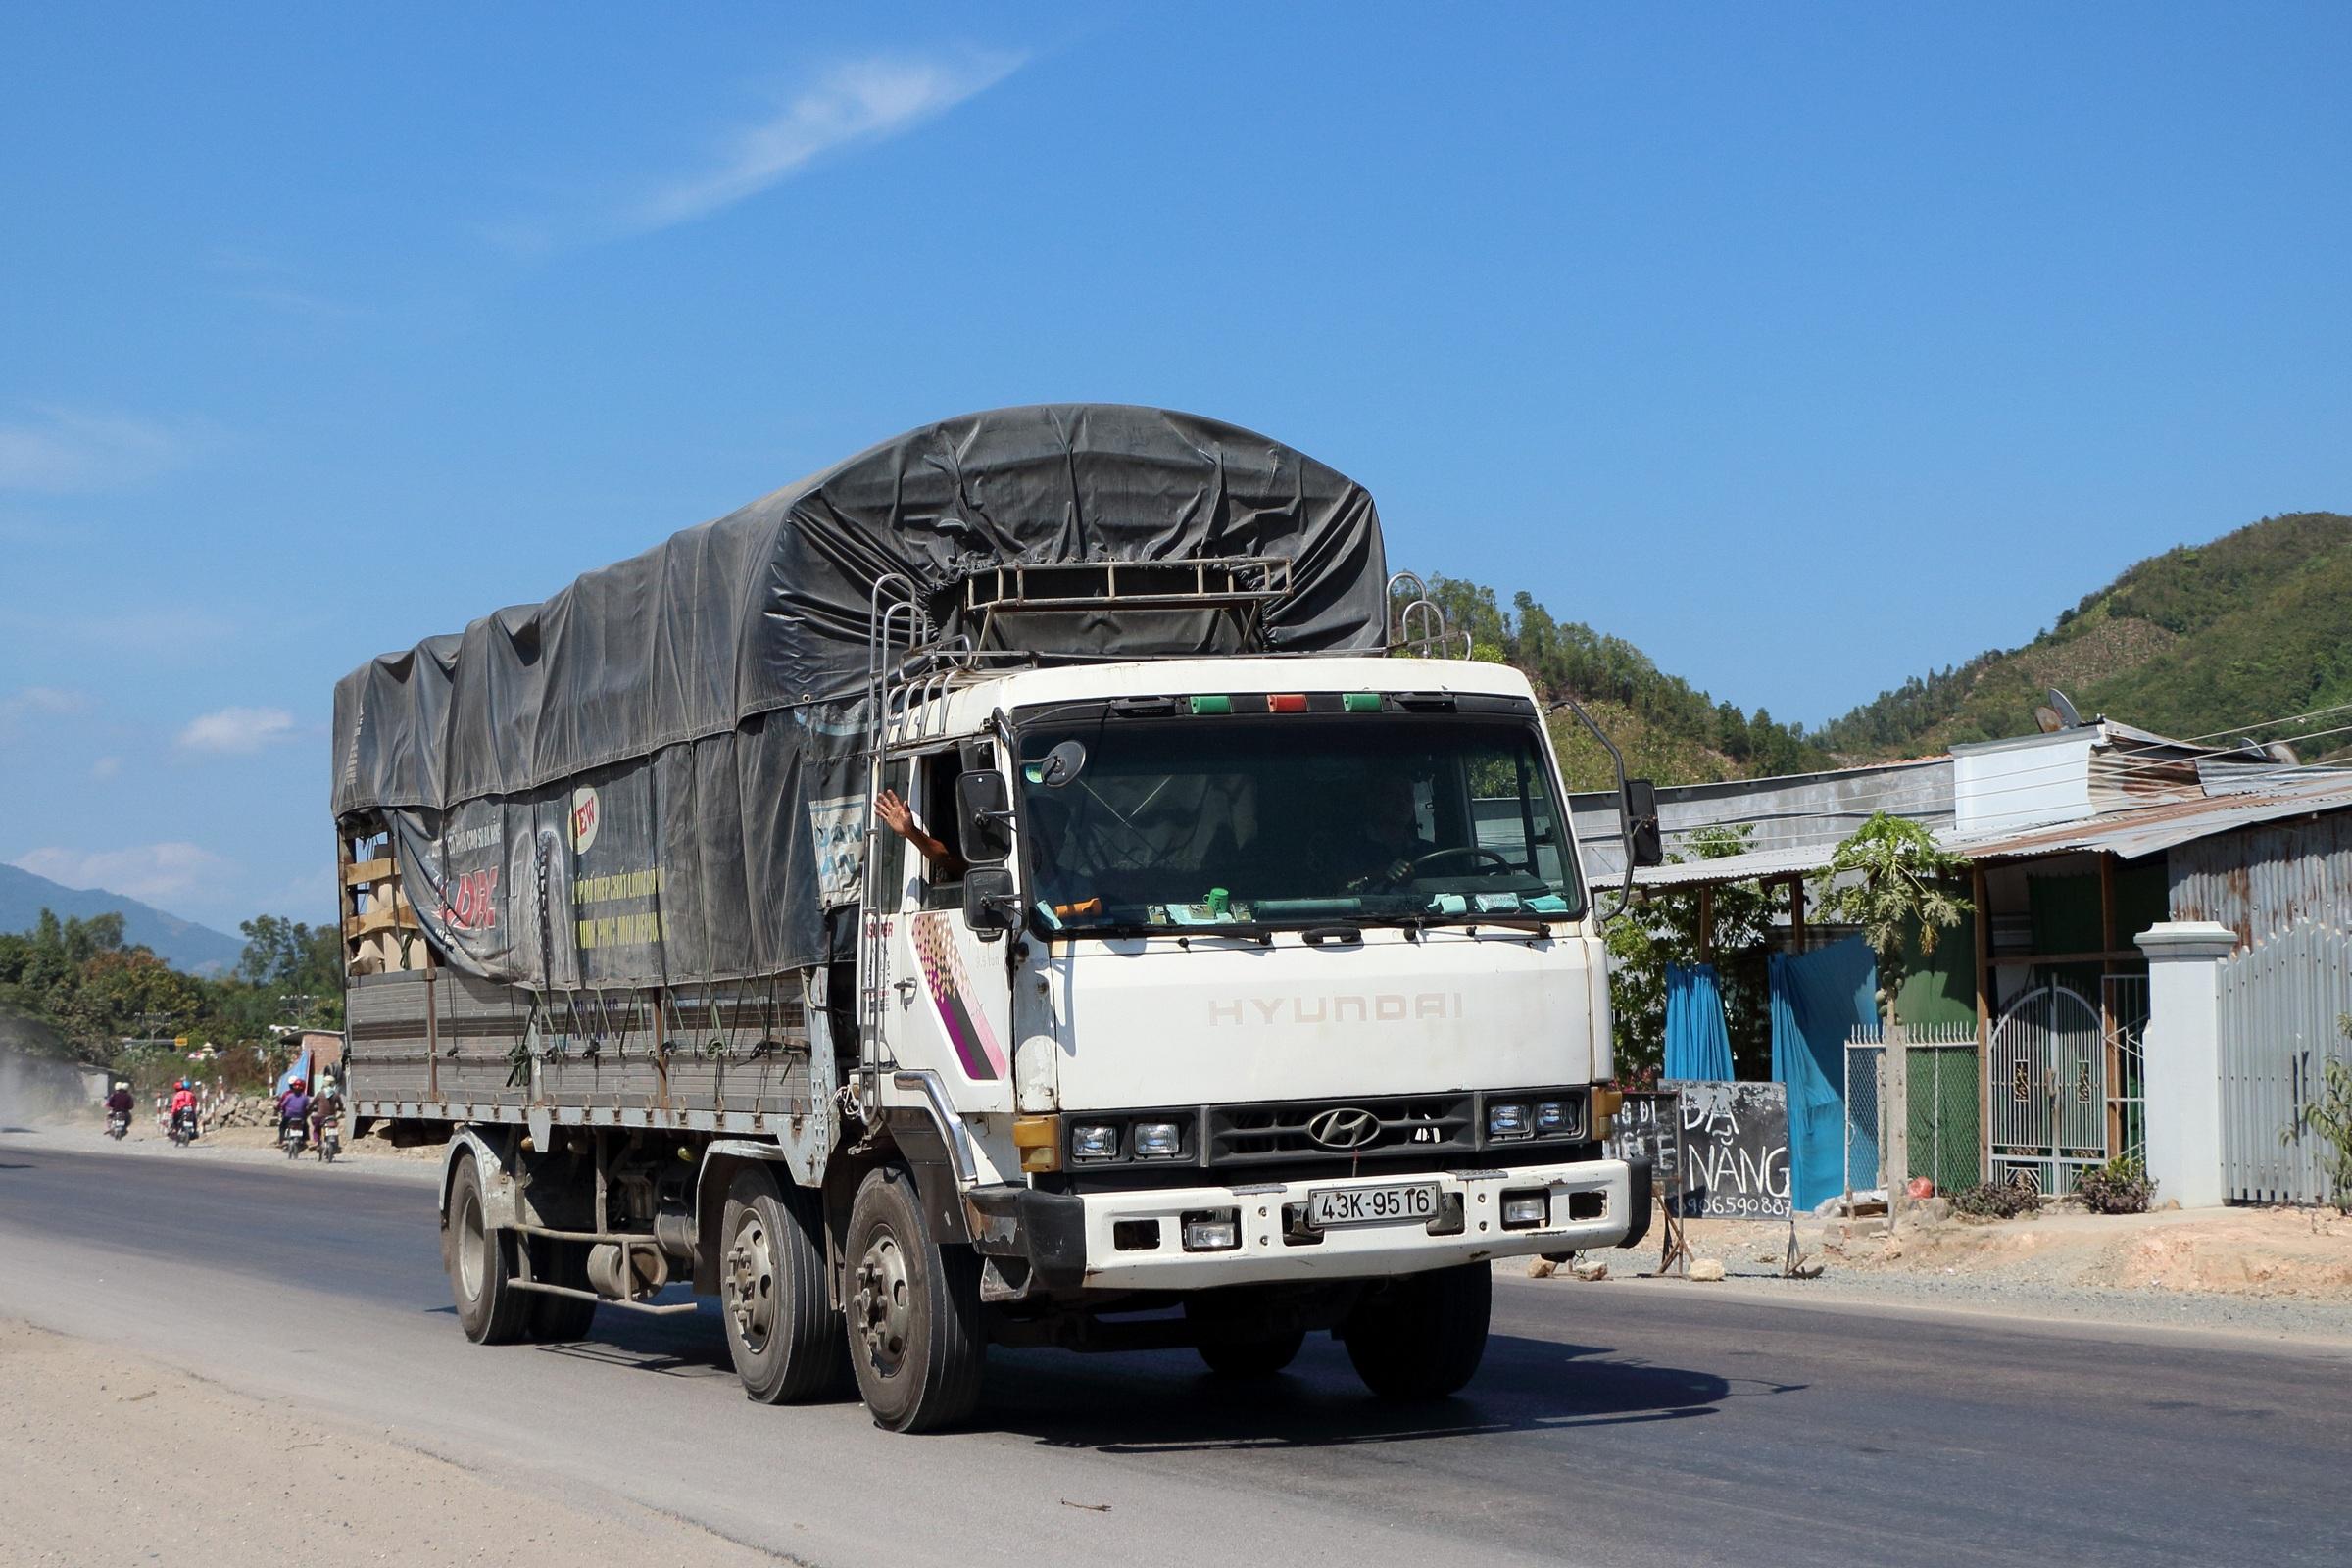 trucks ii mighty wiki wikipedia e hyundai